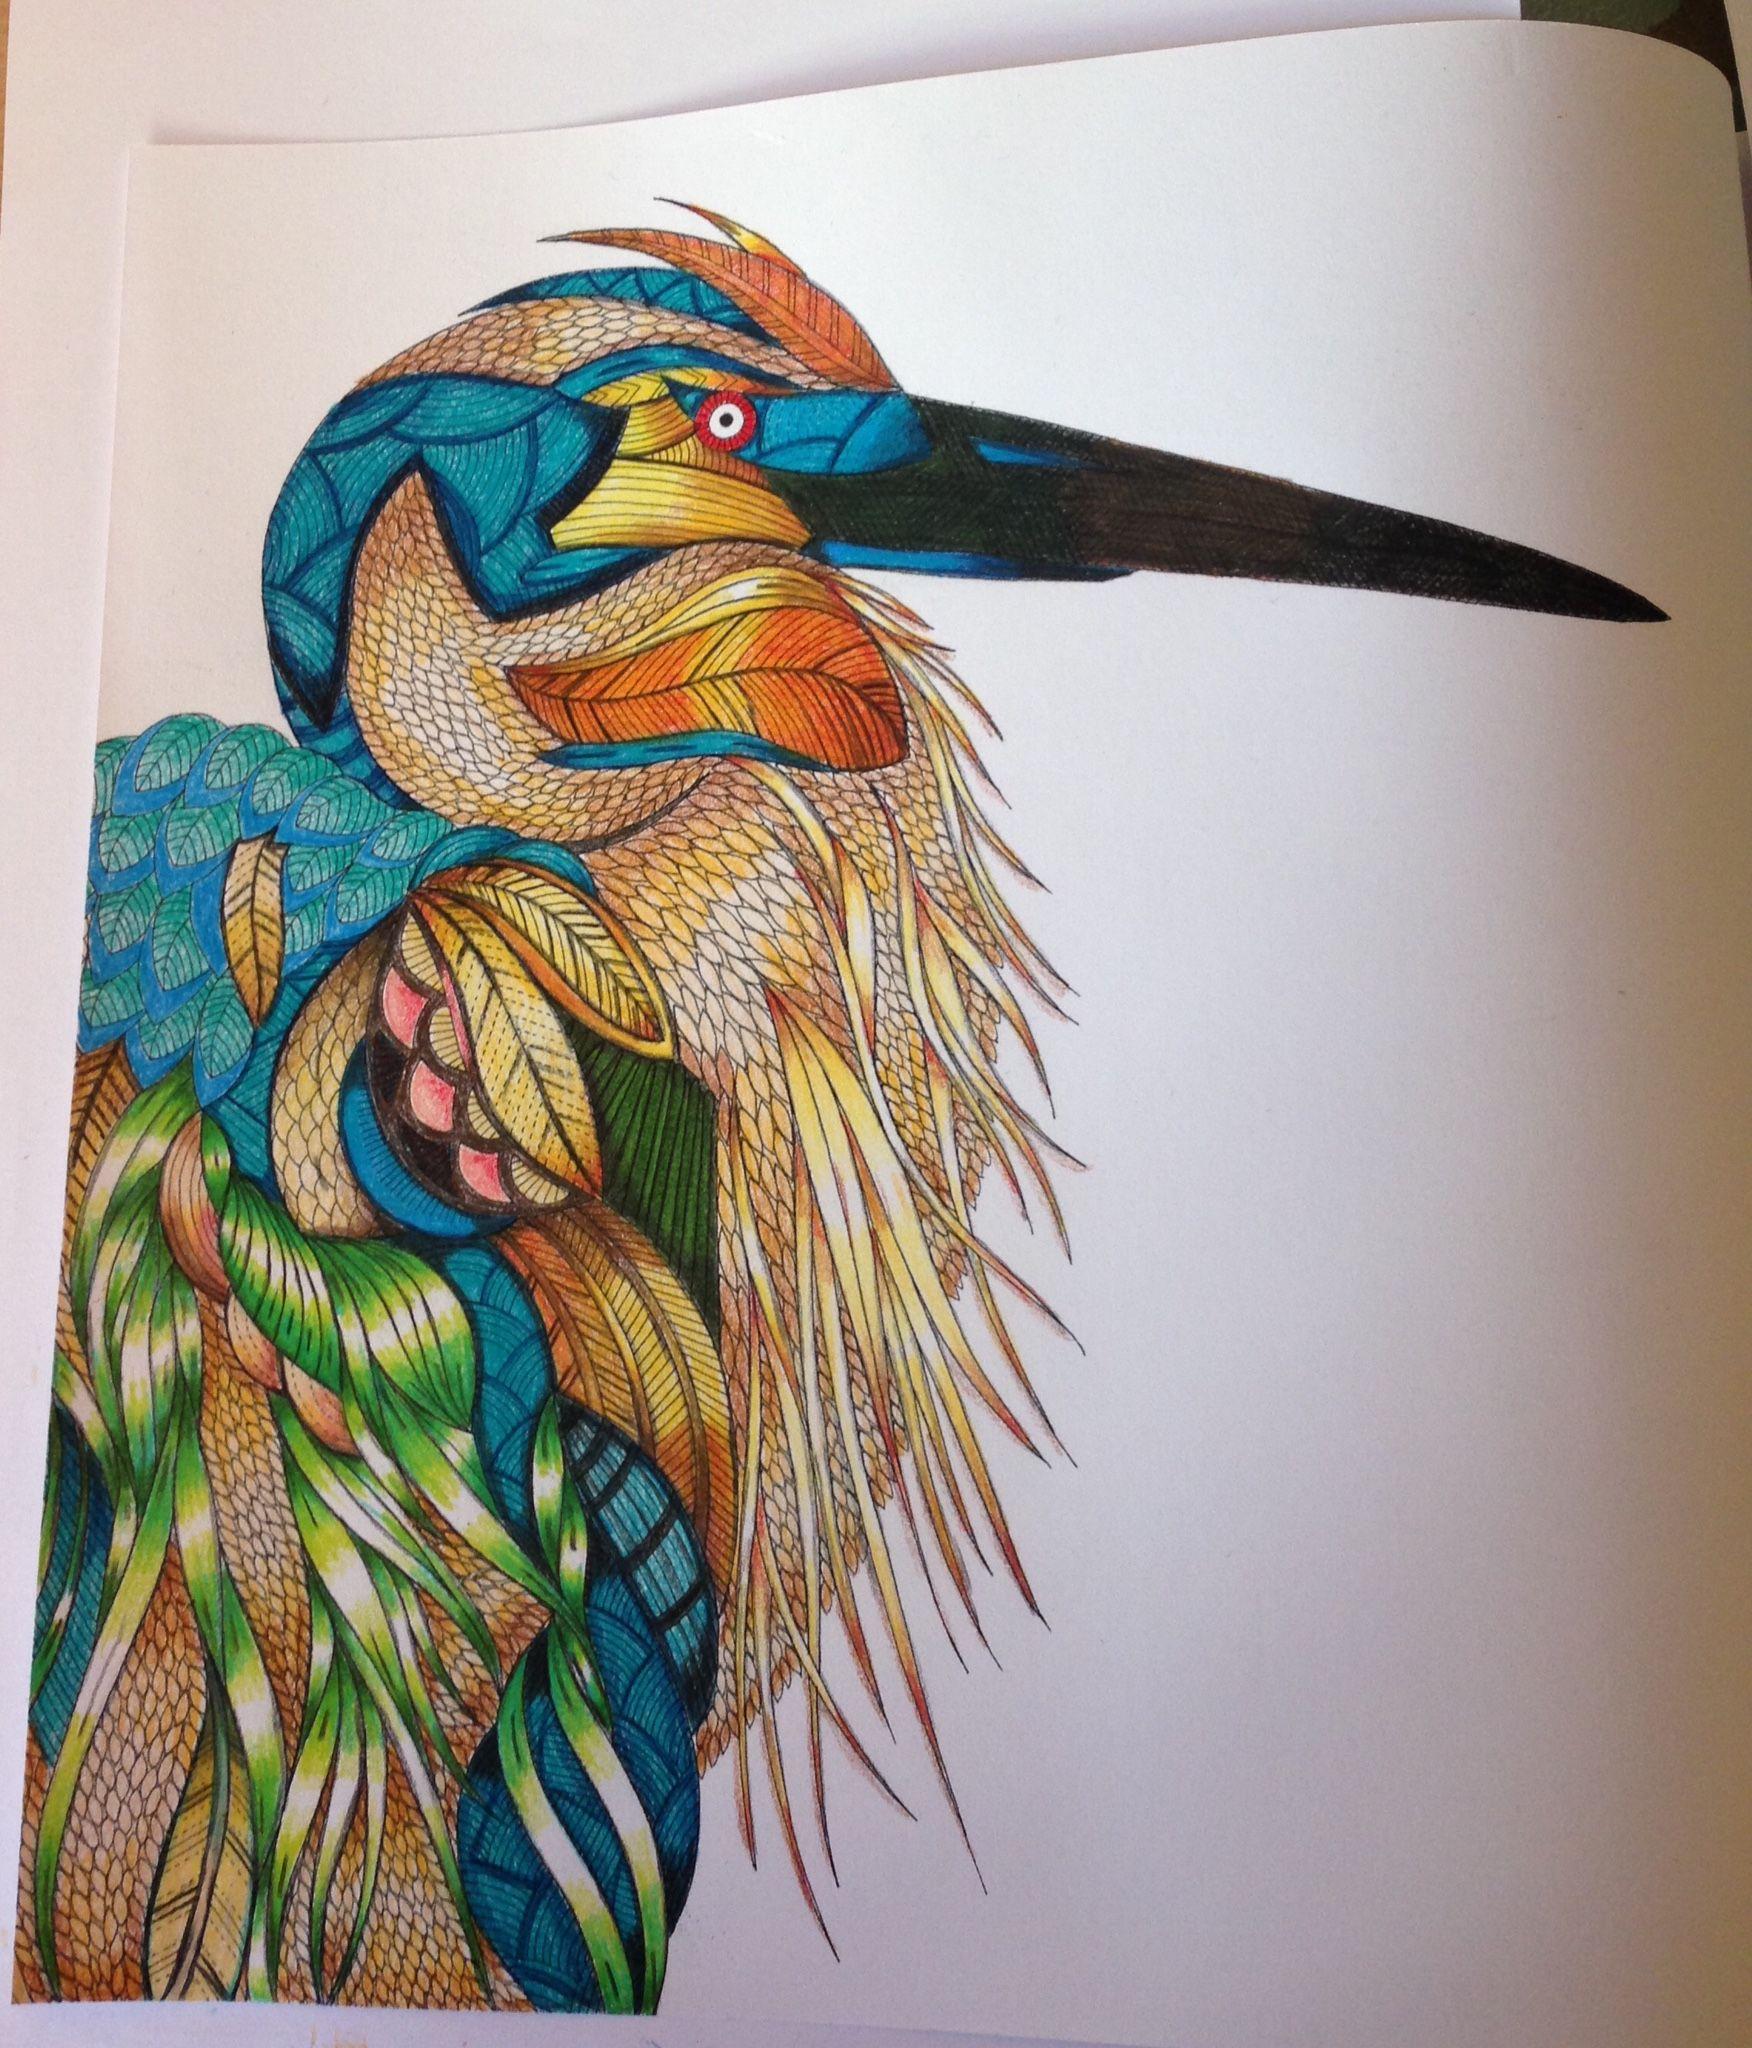 millie marotta Google zoeken Millie Marotta Pinterest Google, Colored pencils and ...